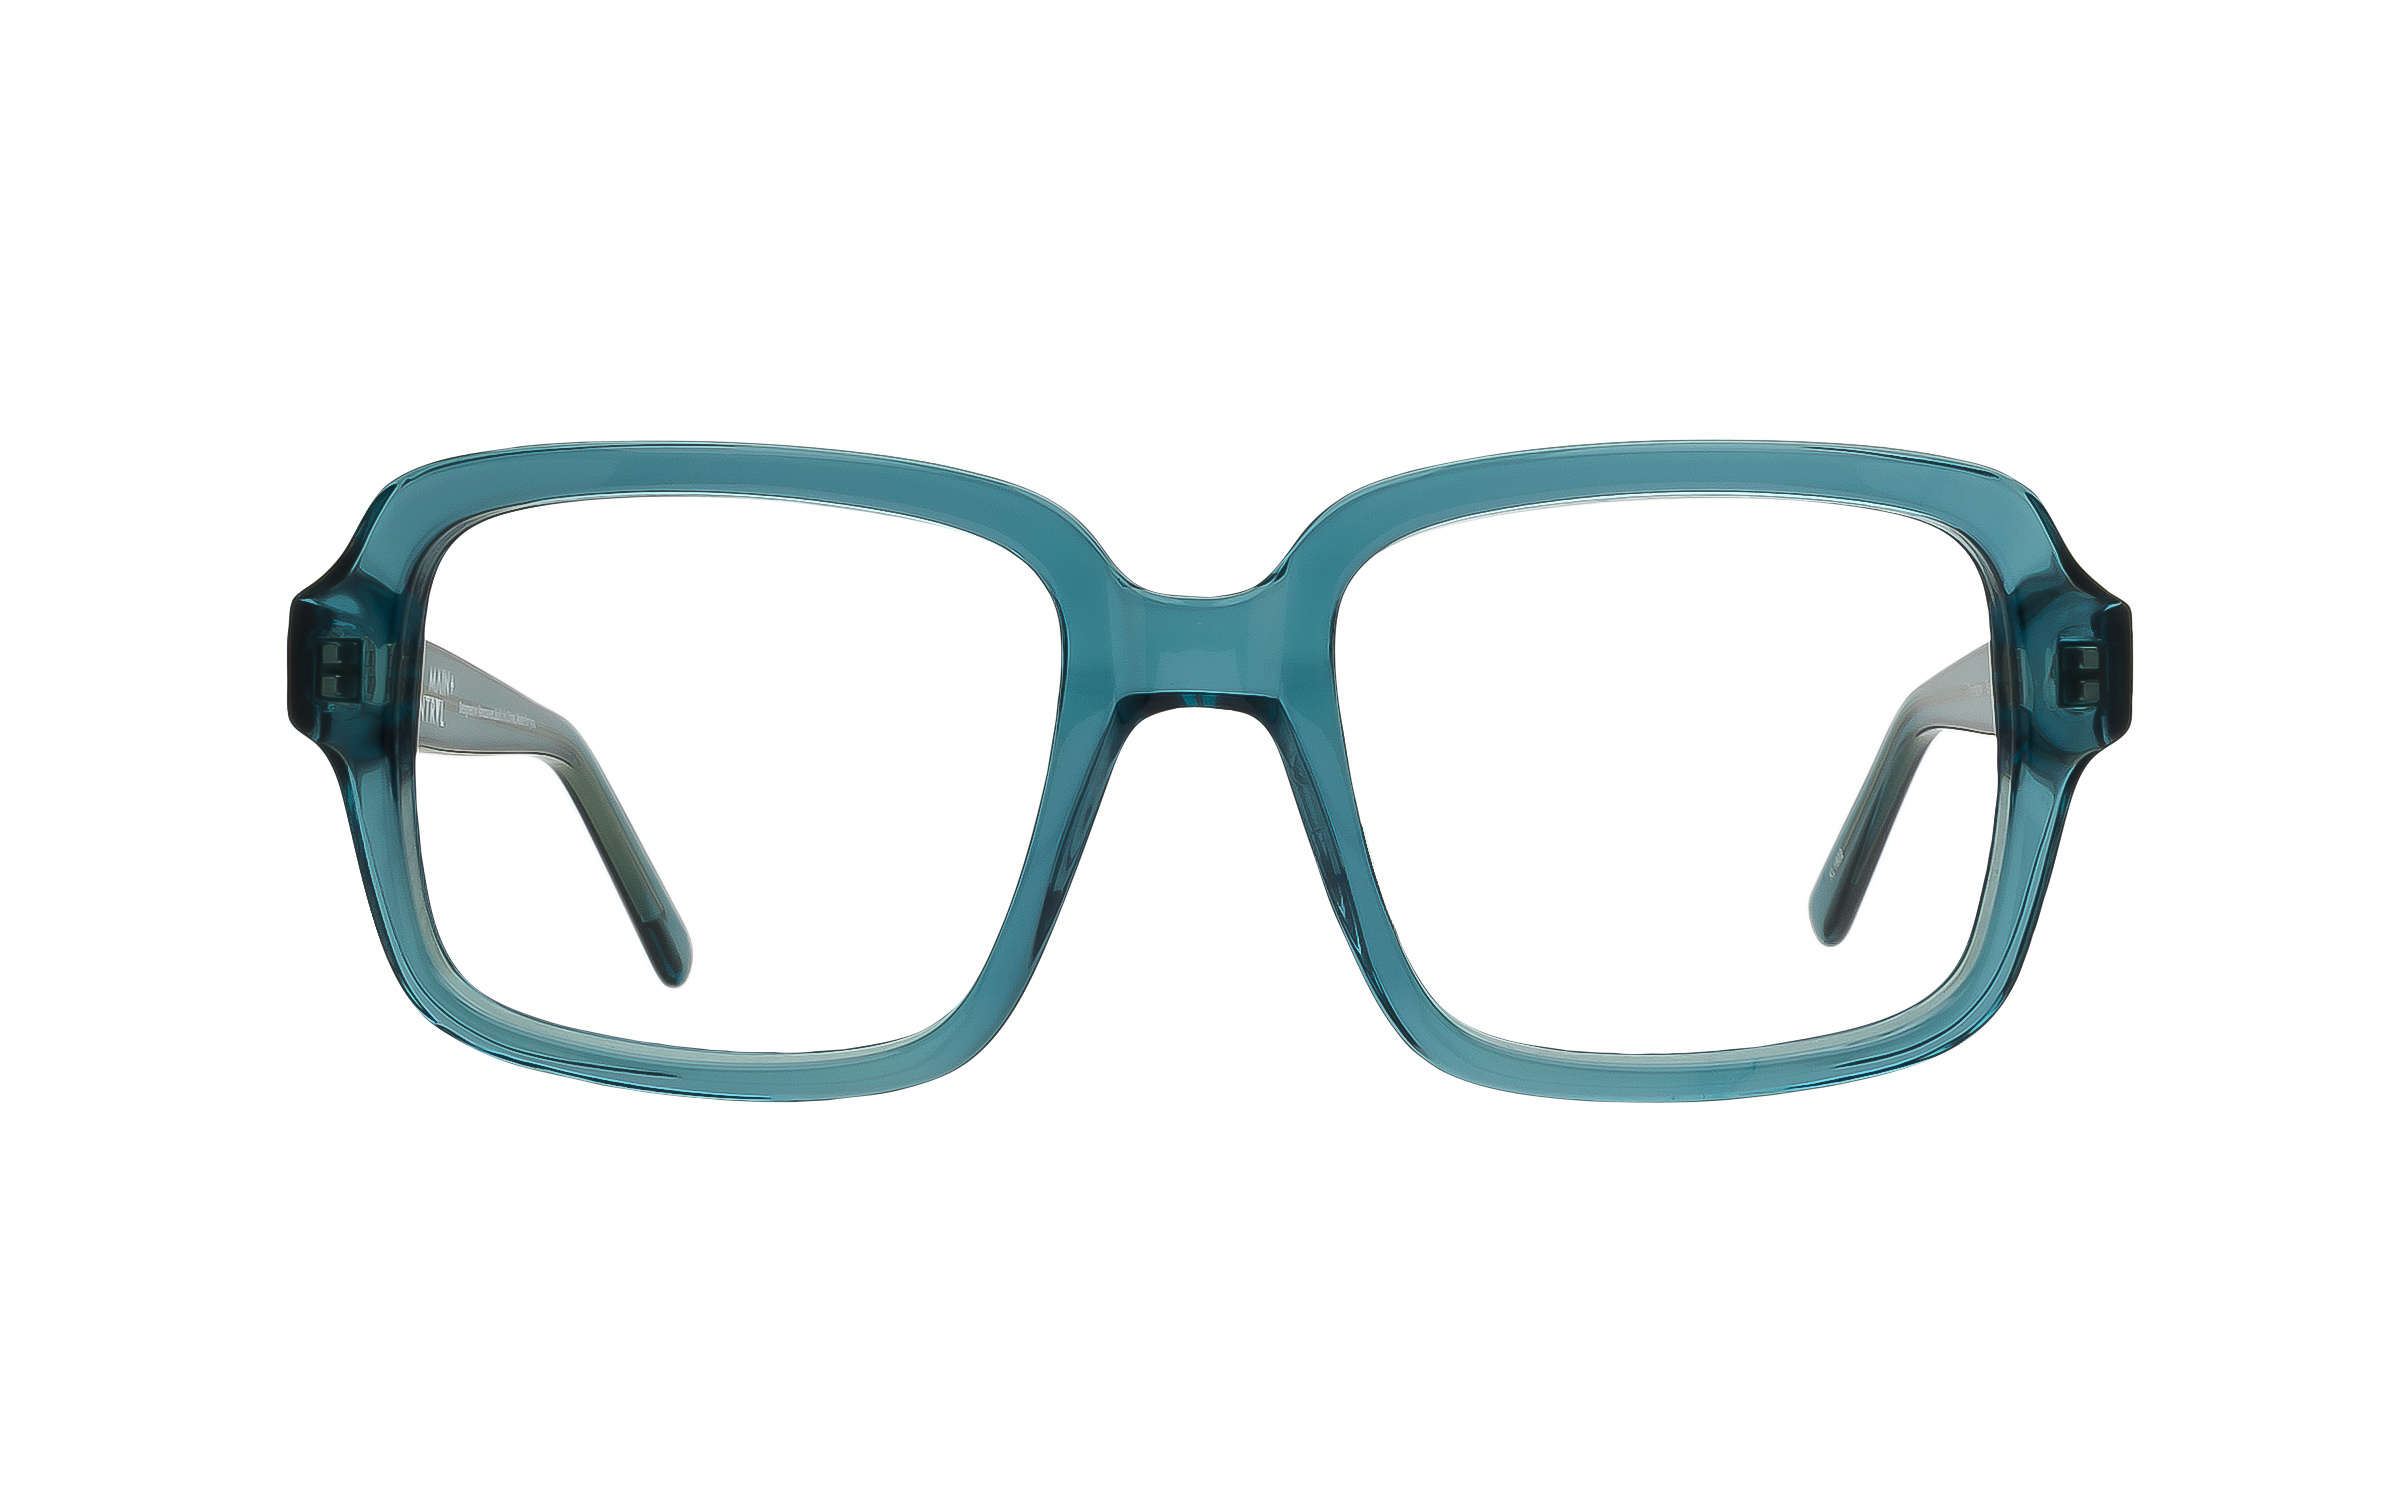 Teal eyeglass frames   Eyeglasses   Compare Prices at Nextag